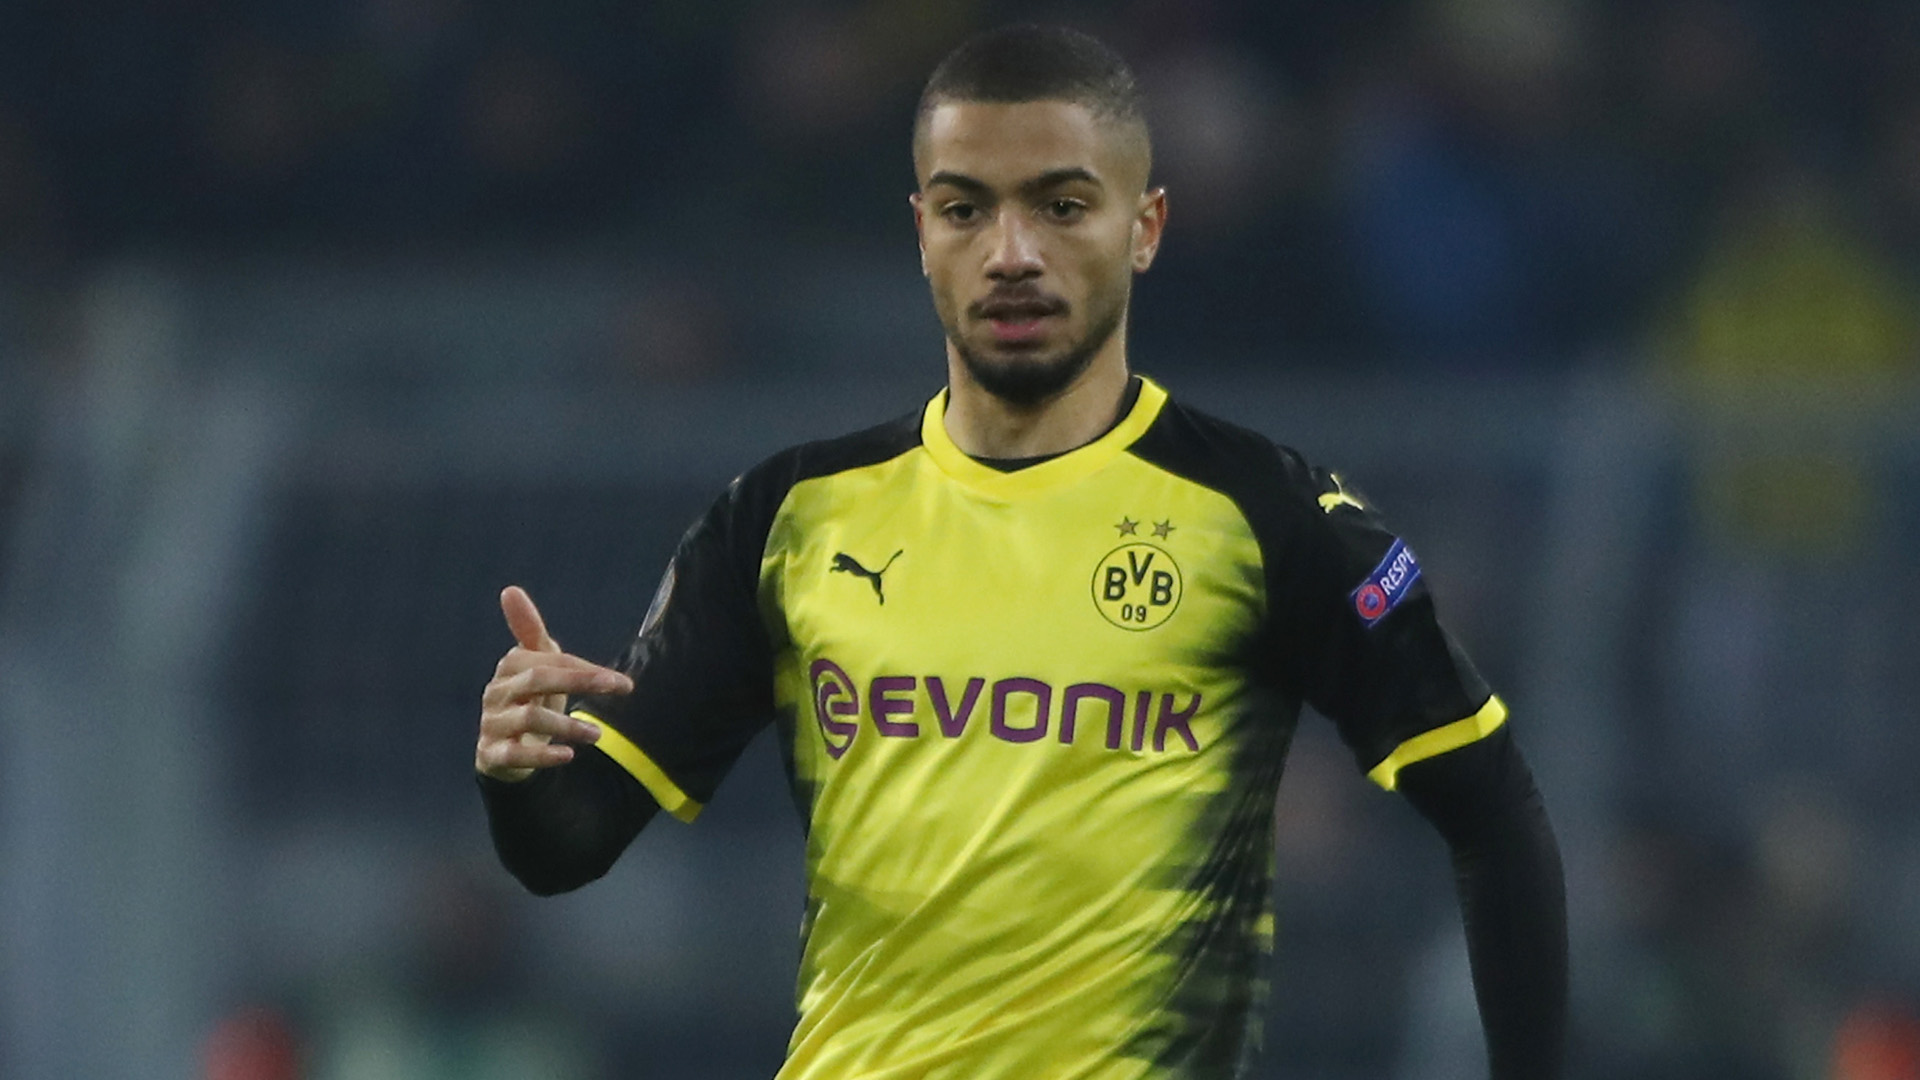 Maglia Home Borussia Dortmund Jeremy Toljan